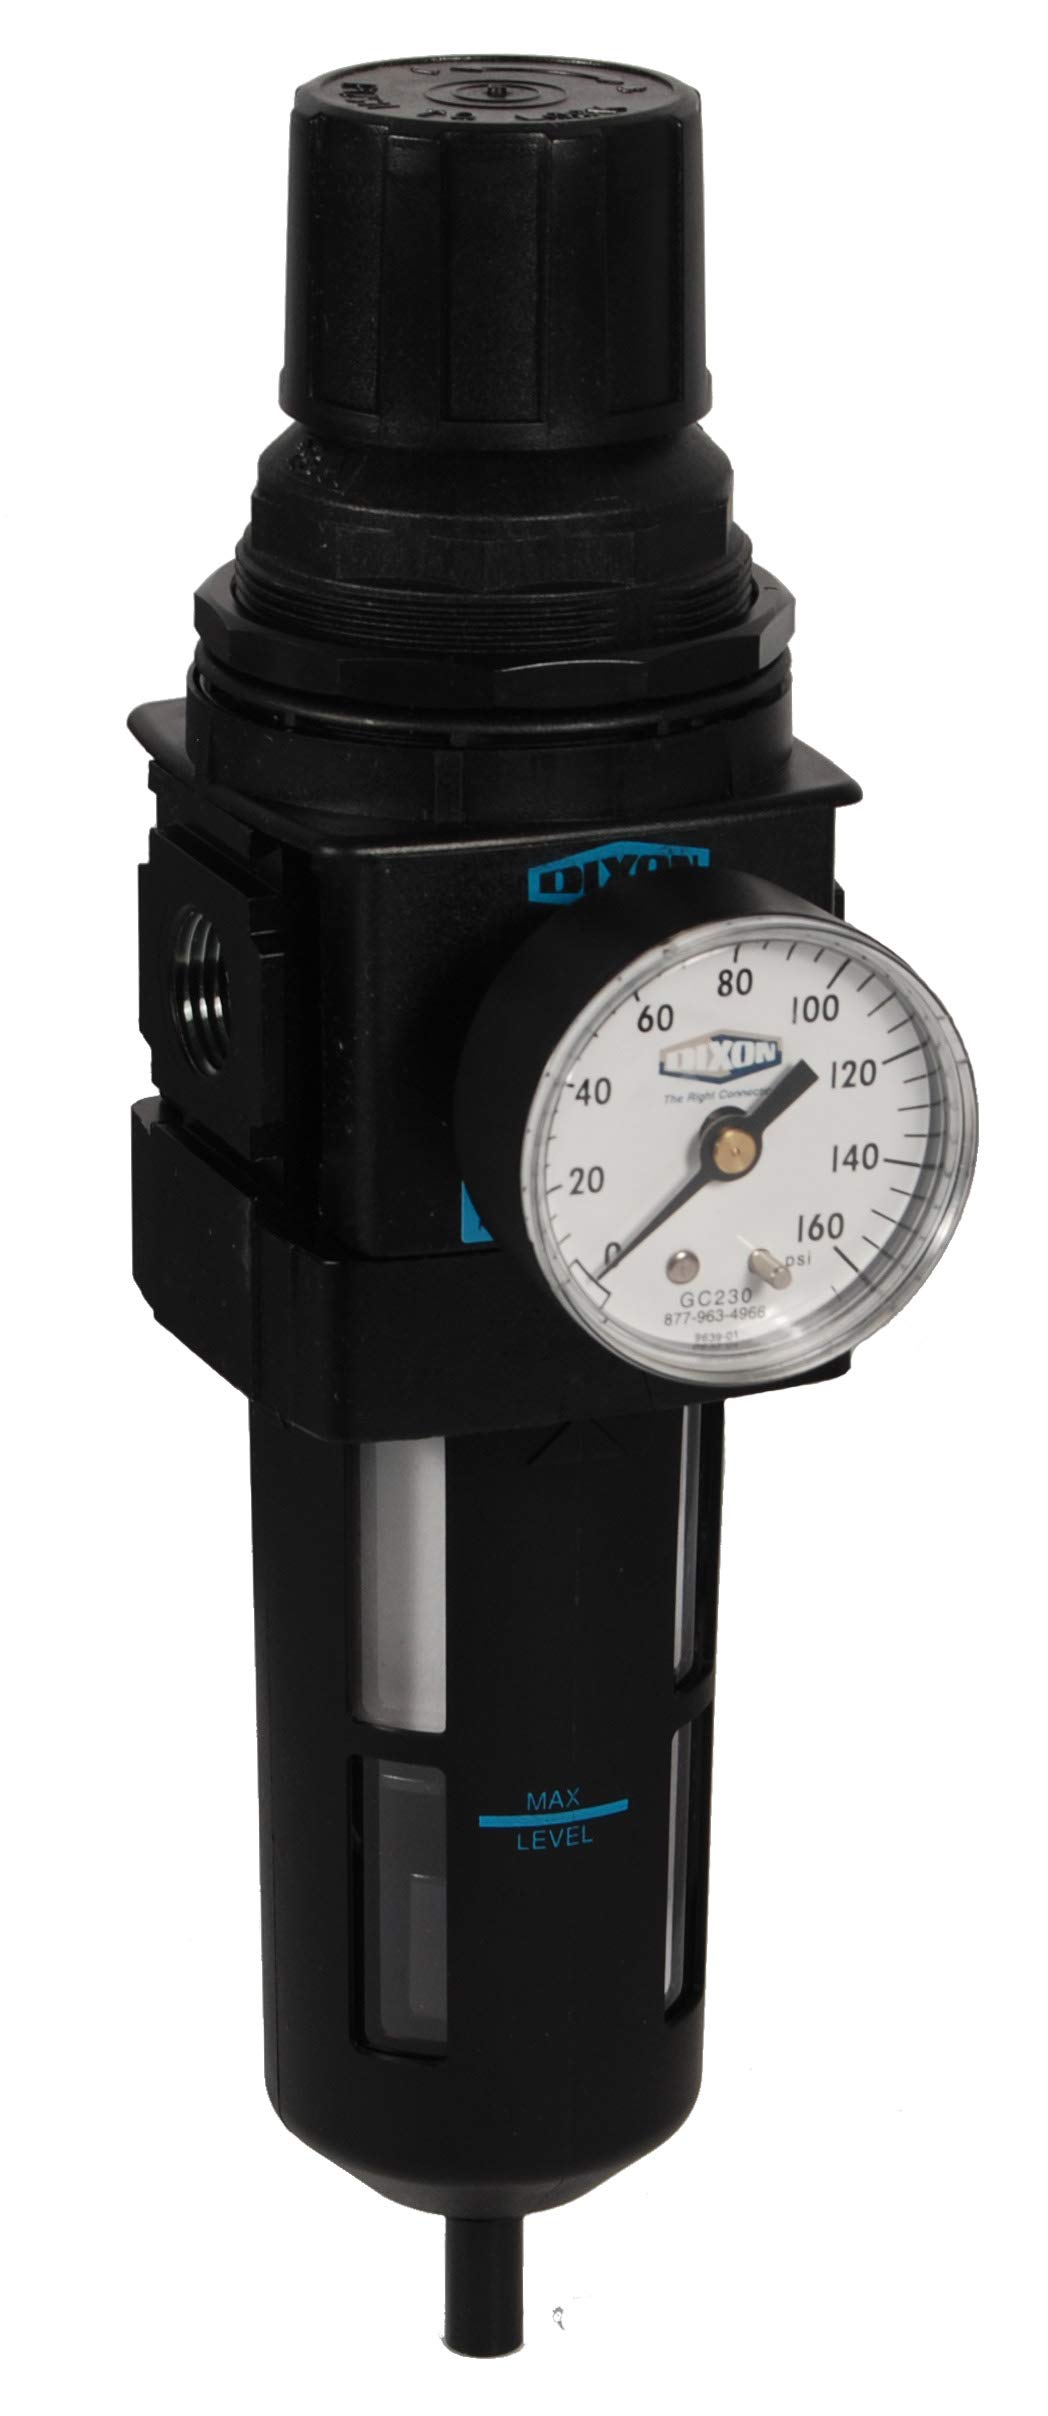 Dixon B28-06MG Manual Drain Wilkerson Standard Filter/Regulator with Transparent Bowl and Guard, 3/4'' Size, 175 SCFM Flow, 150 psig Pressure by Dixon Valve & Coupling